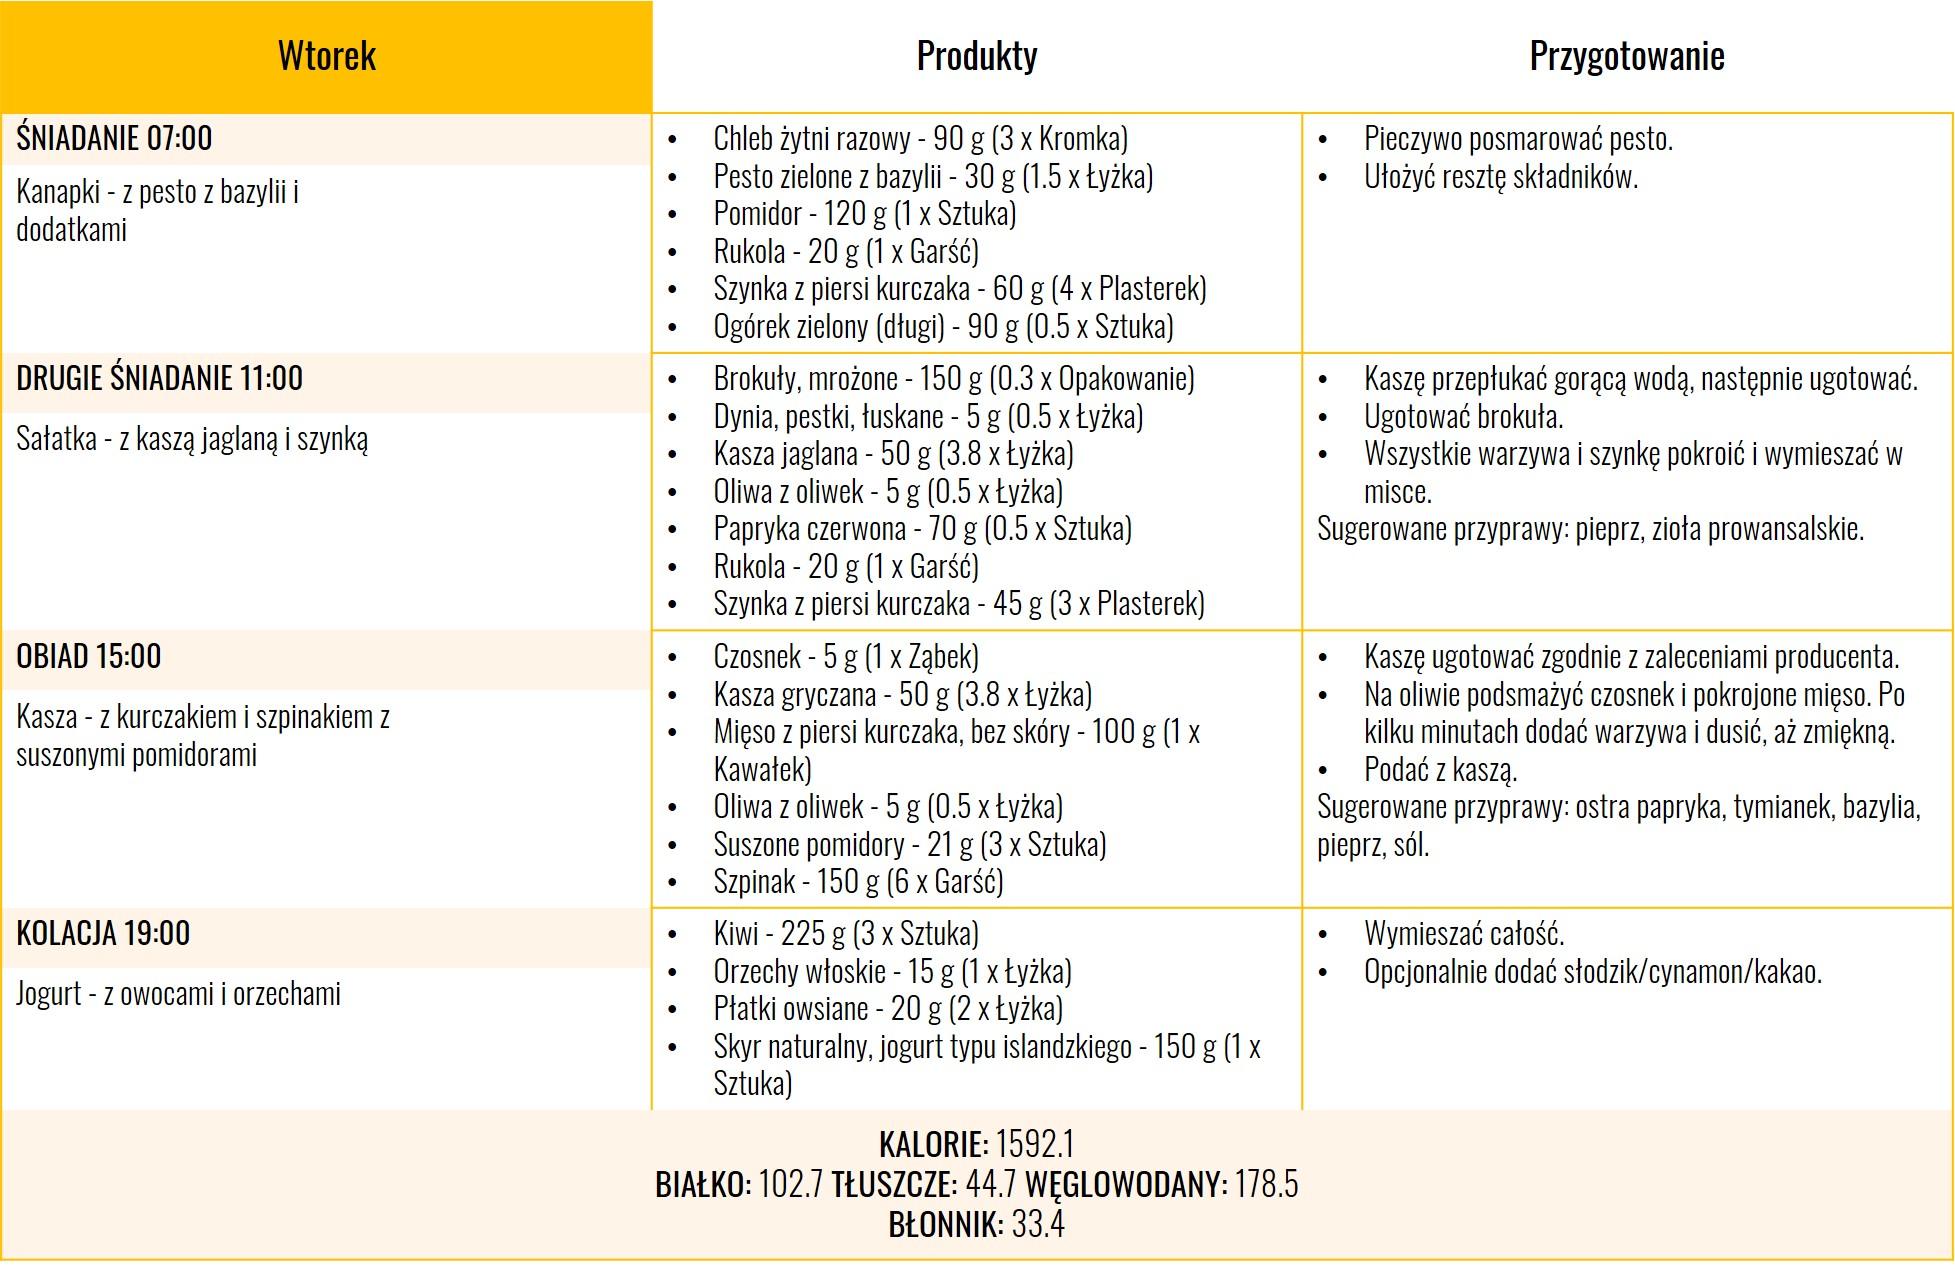 Dieta w insulinoopornosci - dzien 2